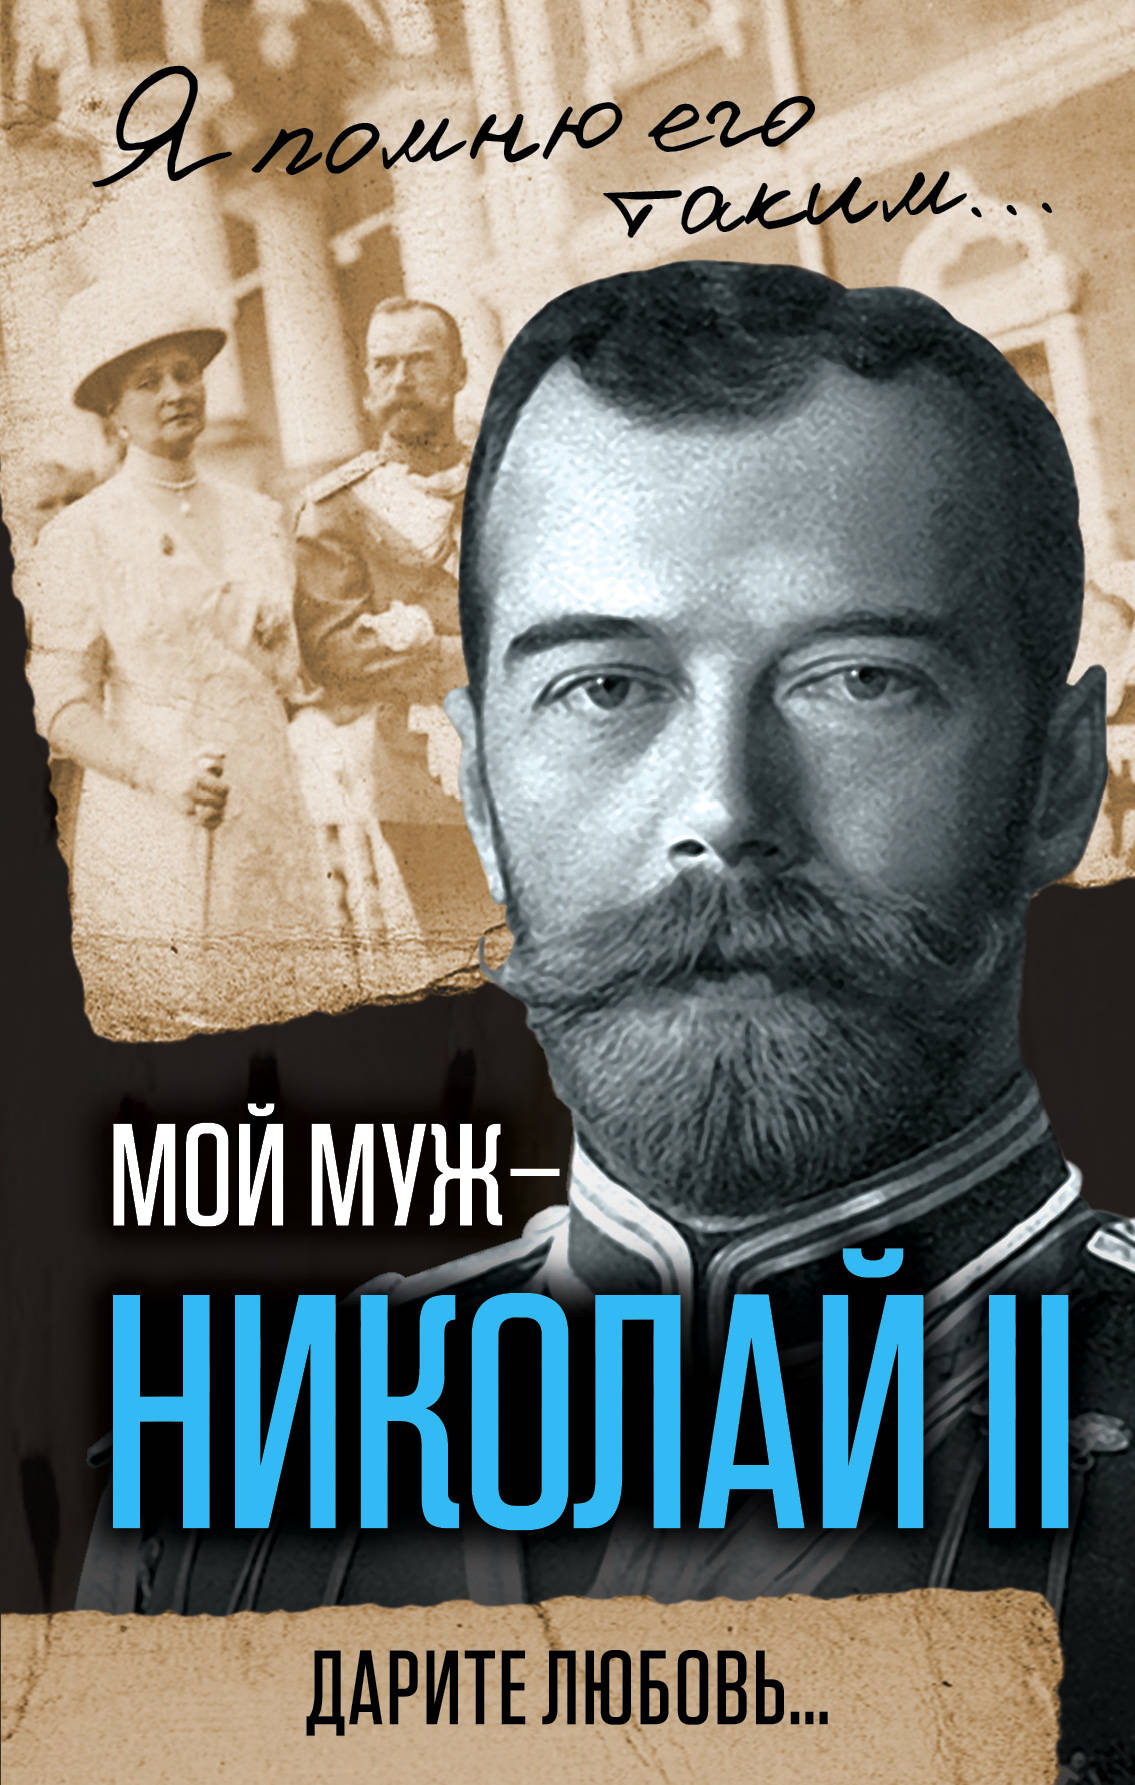 Александра Романова Мой муж - Николай II. Дарите любовь...